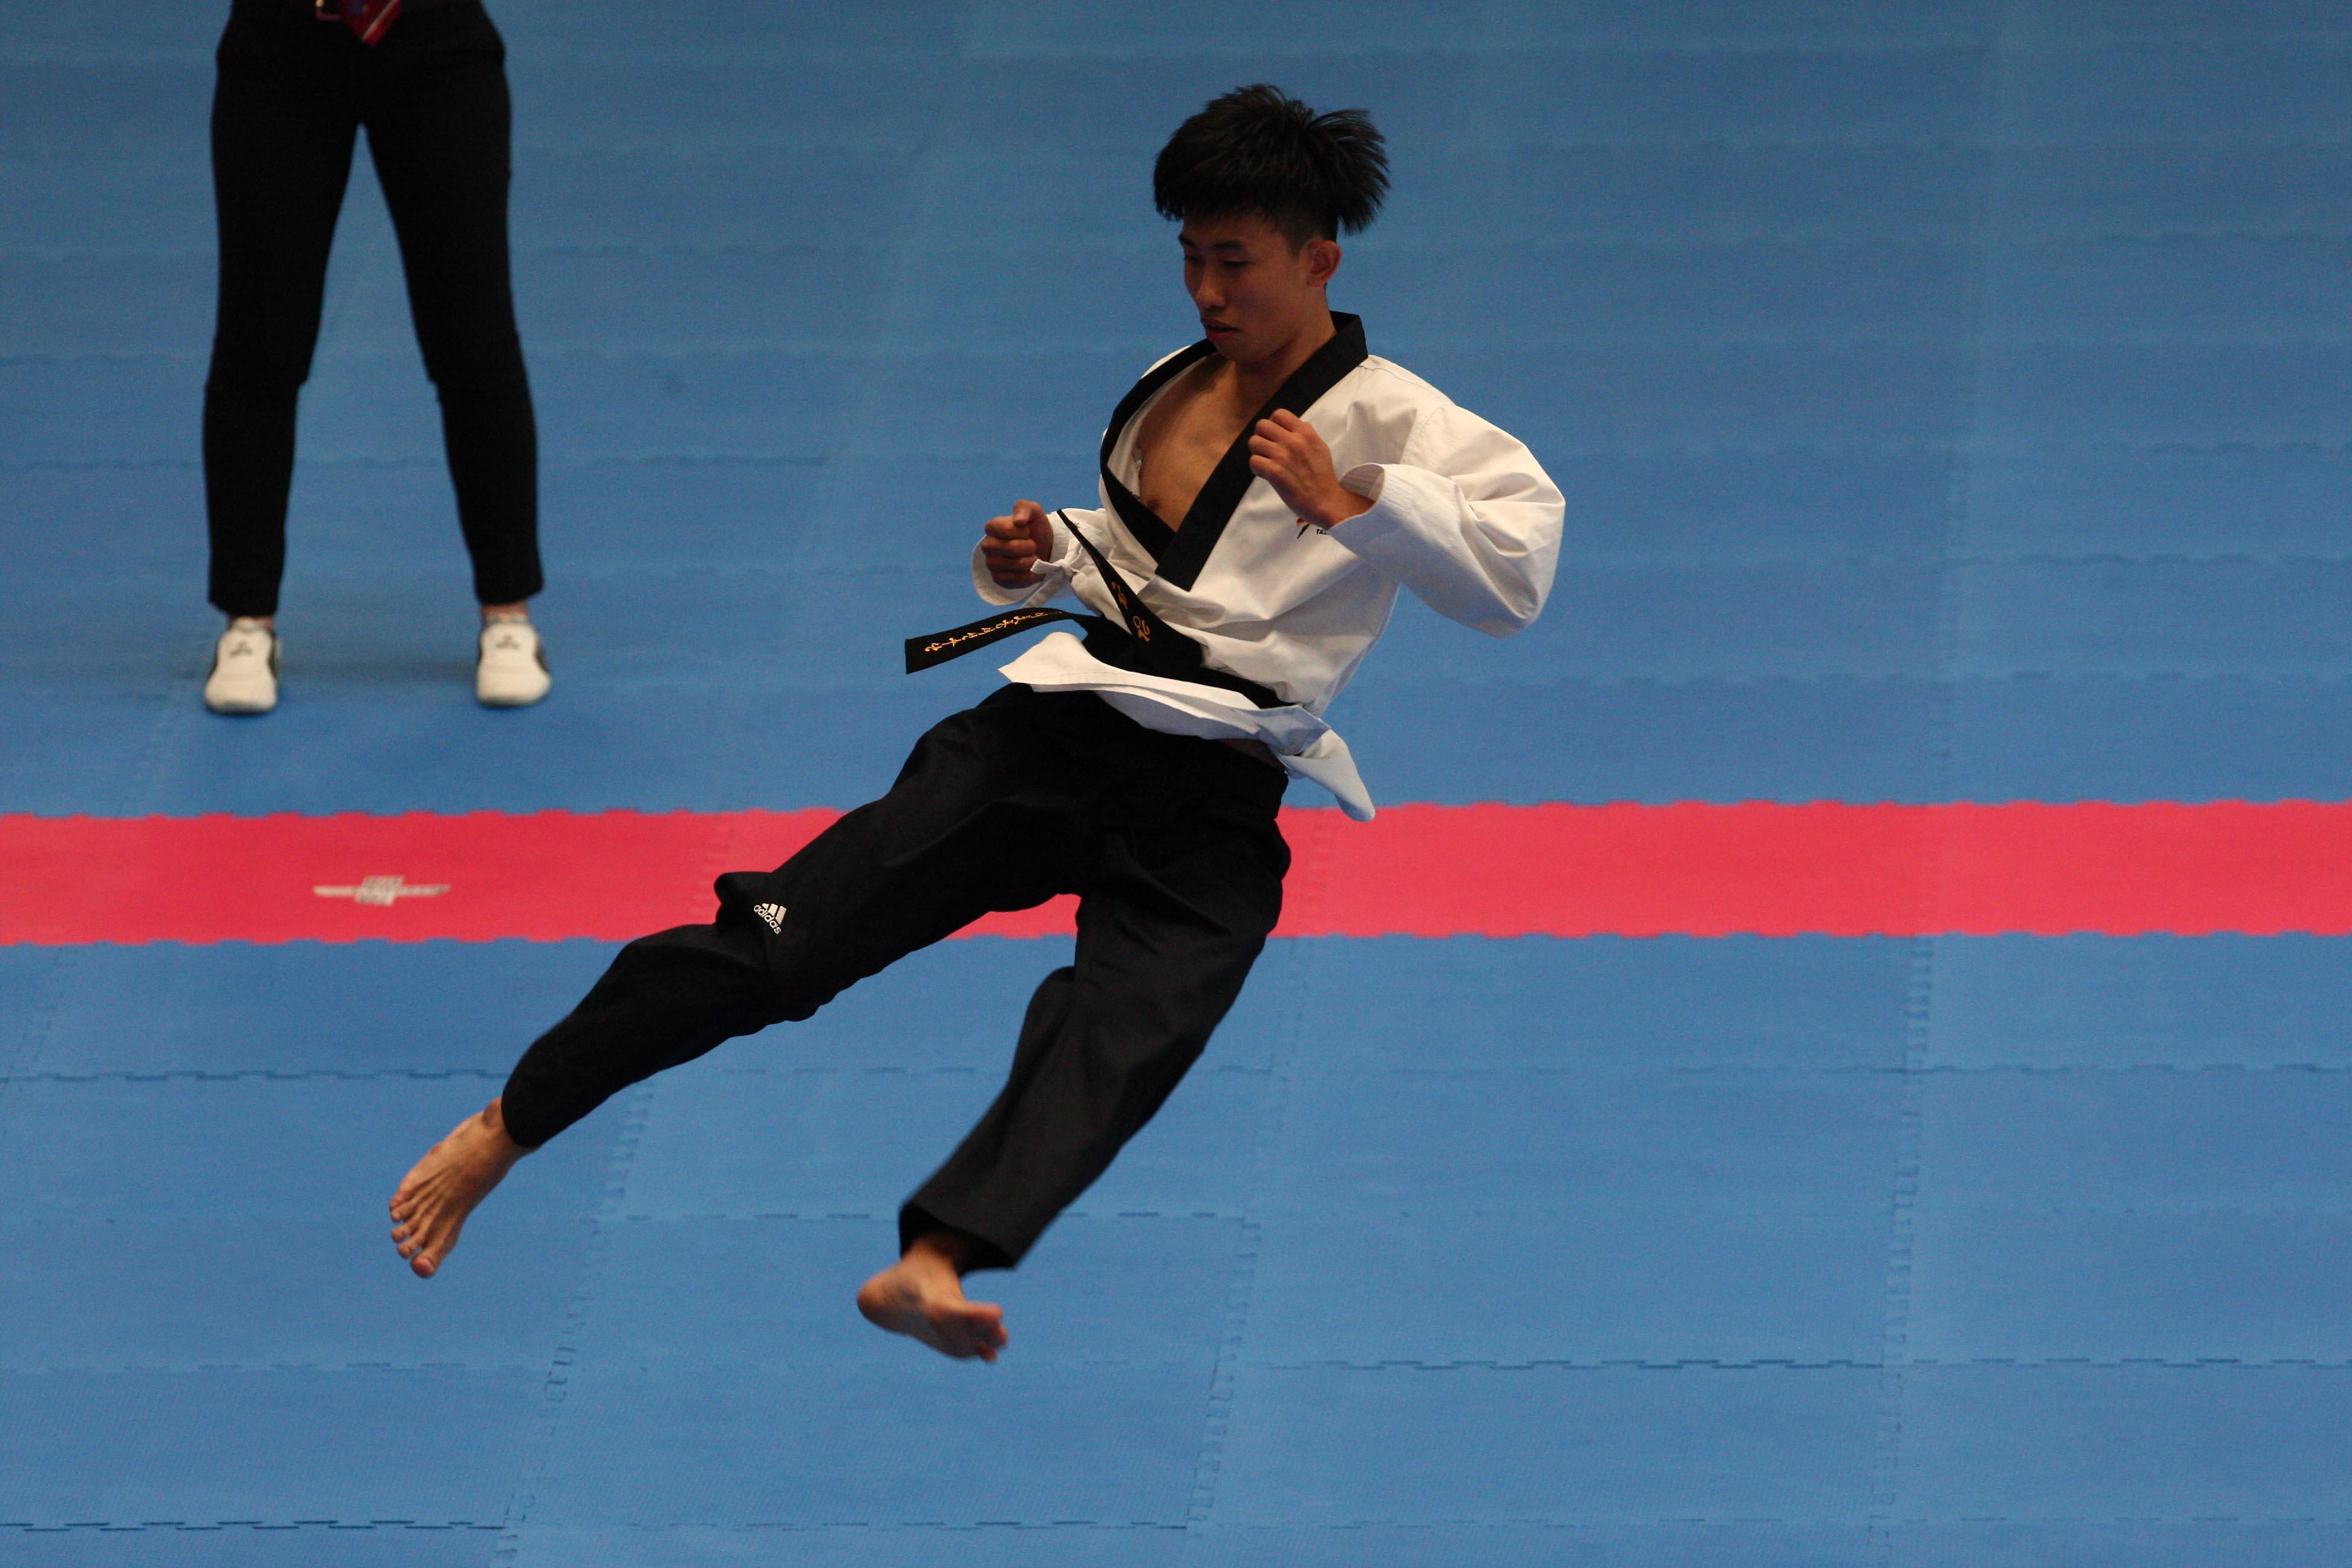 Pala Casoria finali di Taekwondo Kang Wanjin Korea , Napoli 7 Luglio 2019 Photo pool fotografi Universiadi